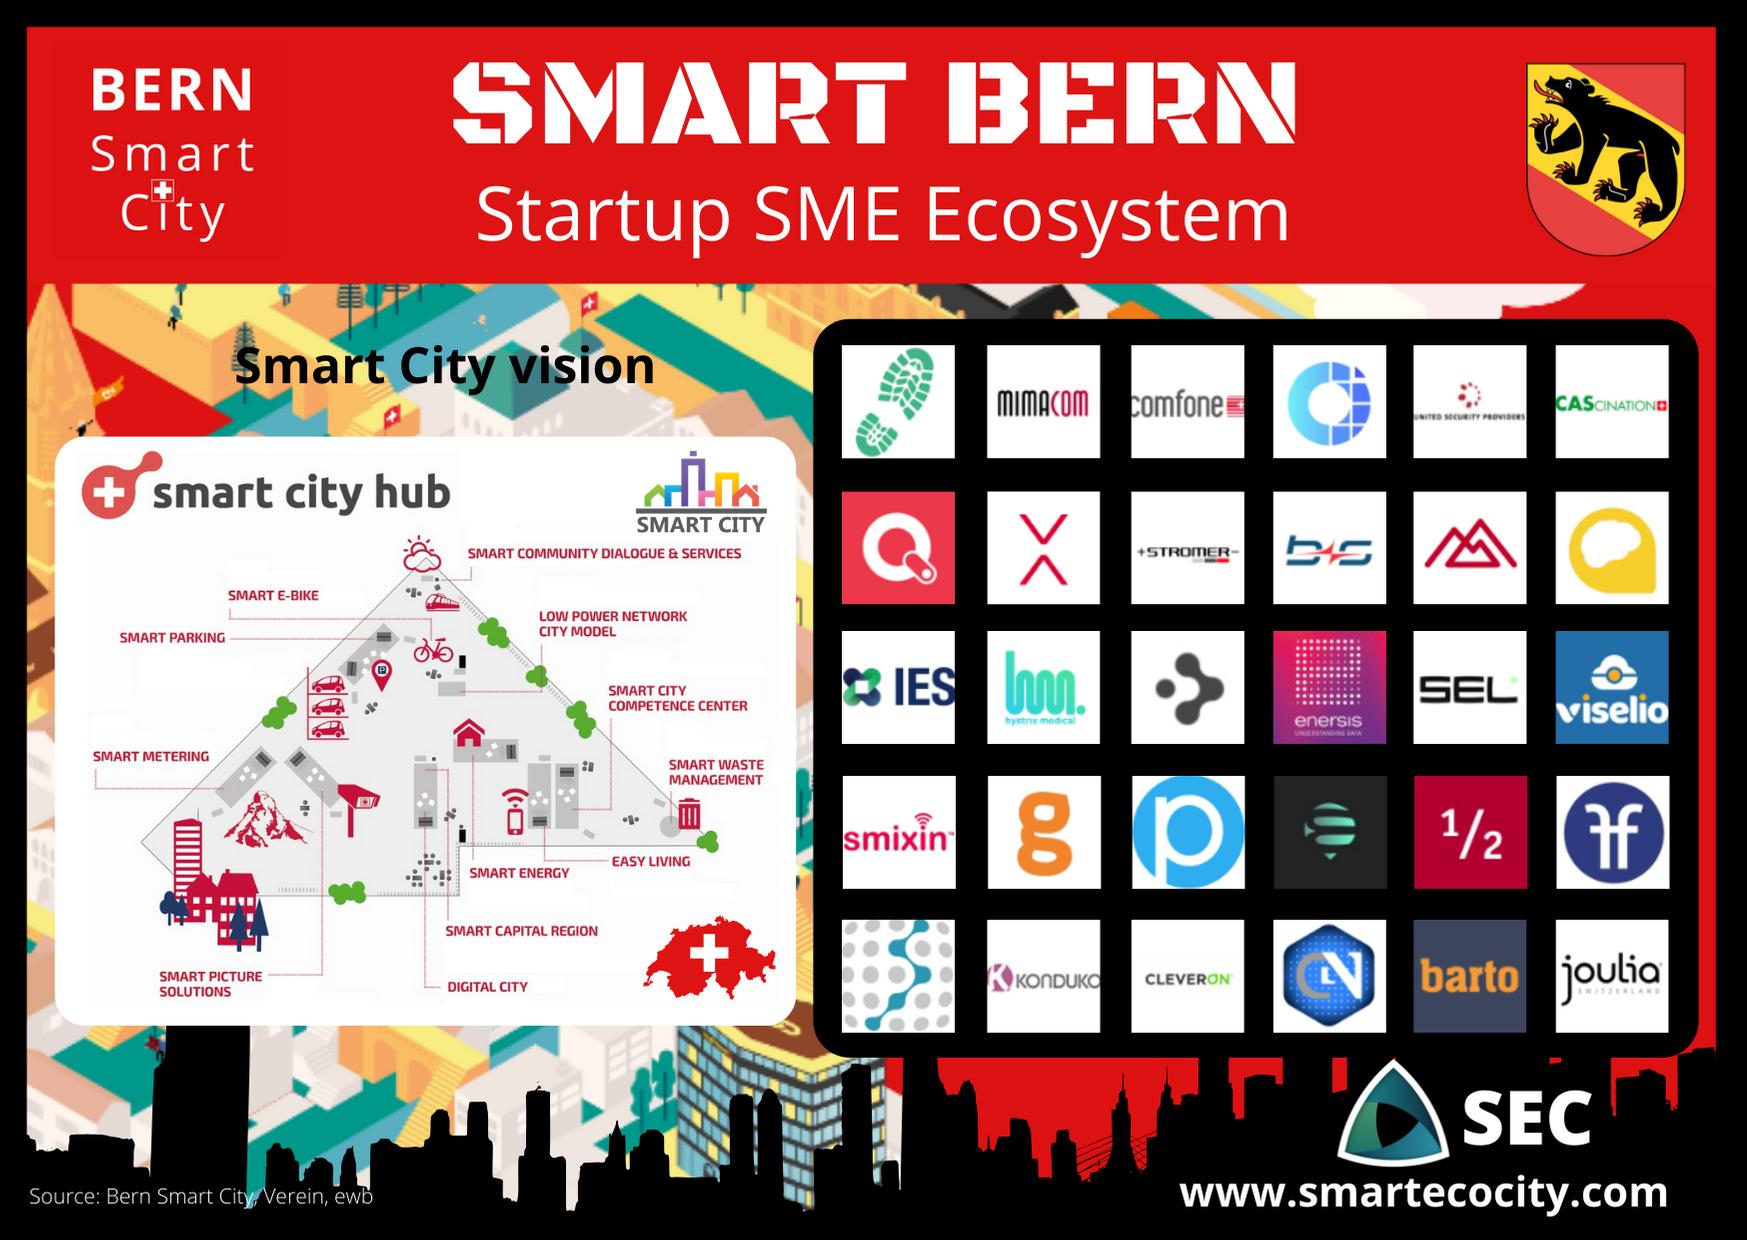 Bern Smart City